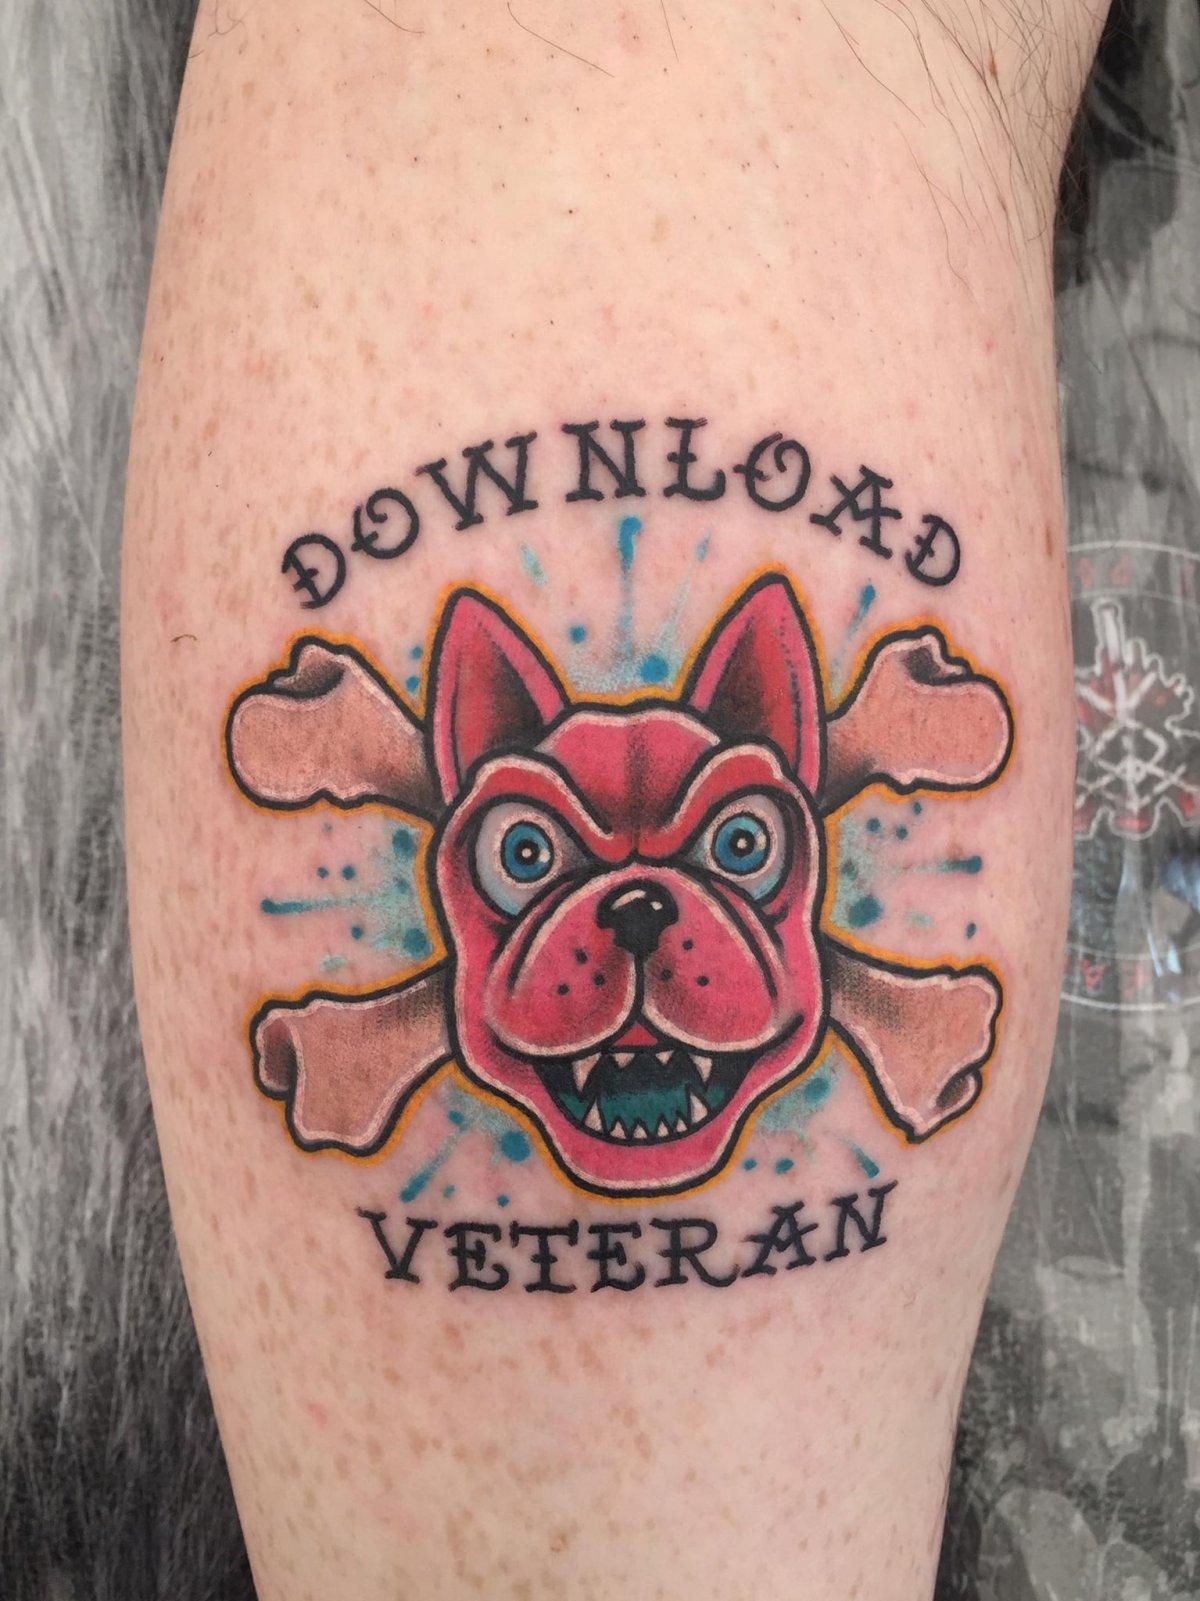 Tattoo Making software, free downloadmilkwestern